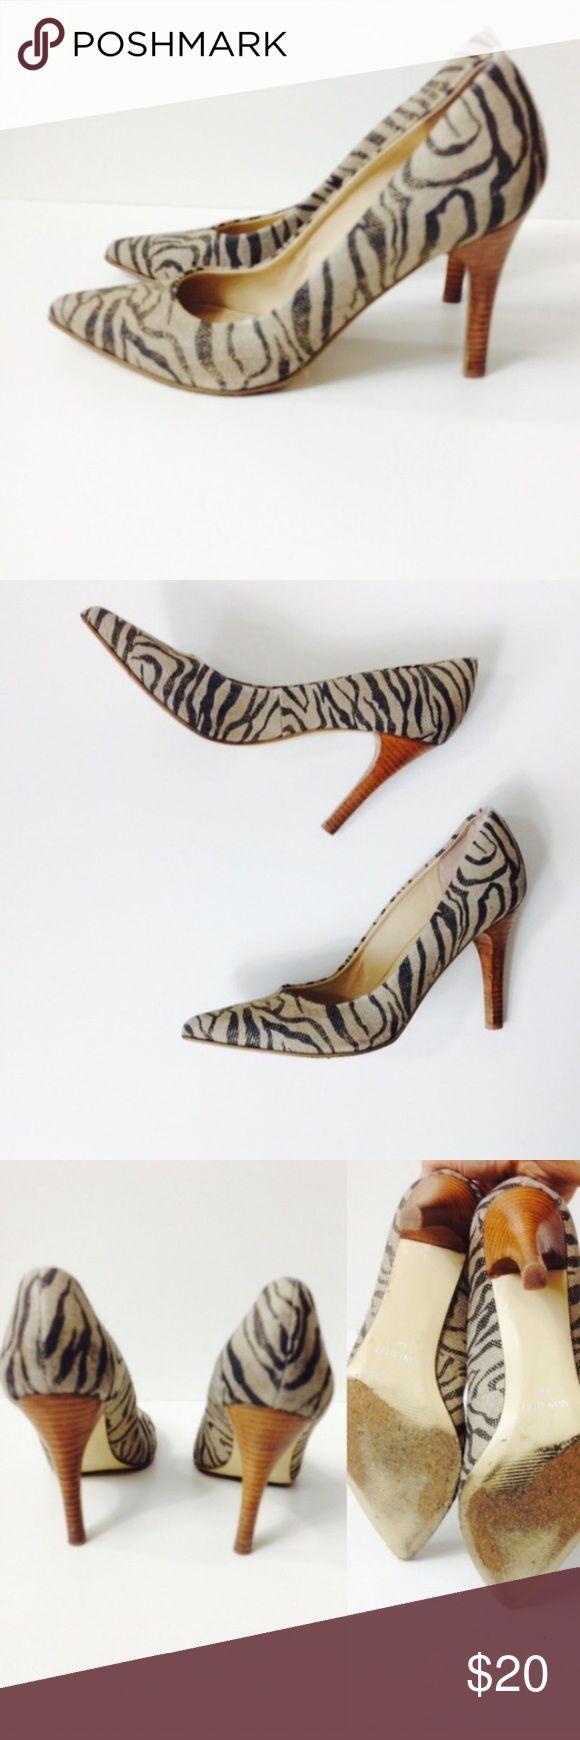 Nine West animal print zebra heels Nine West animal print zebra heels; some dirt on back left shoe and a defect on the heel - see pics Nine West Shoes Heels